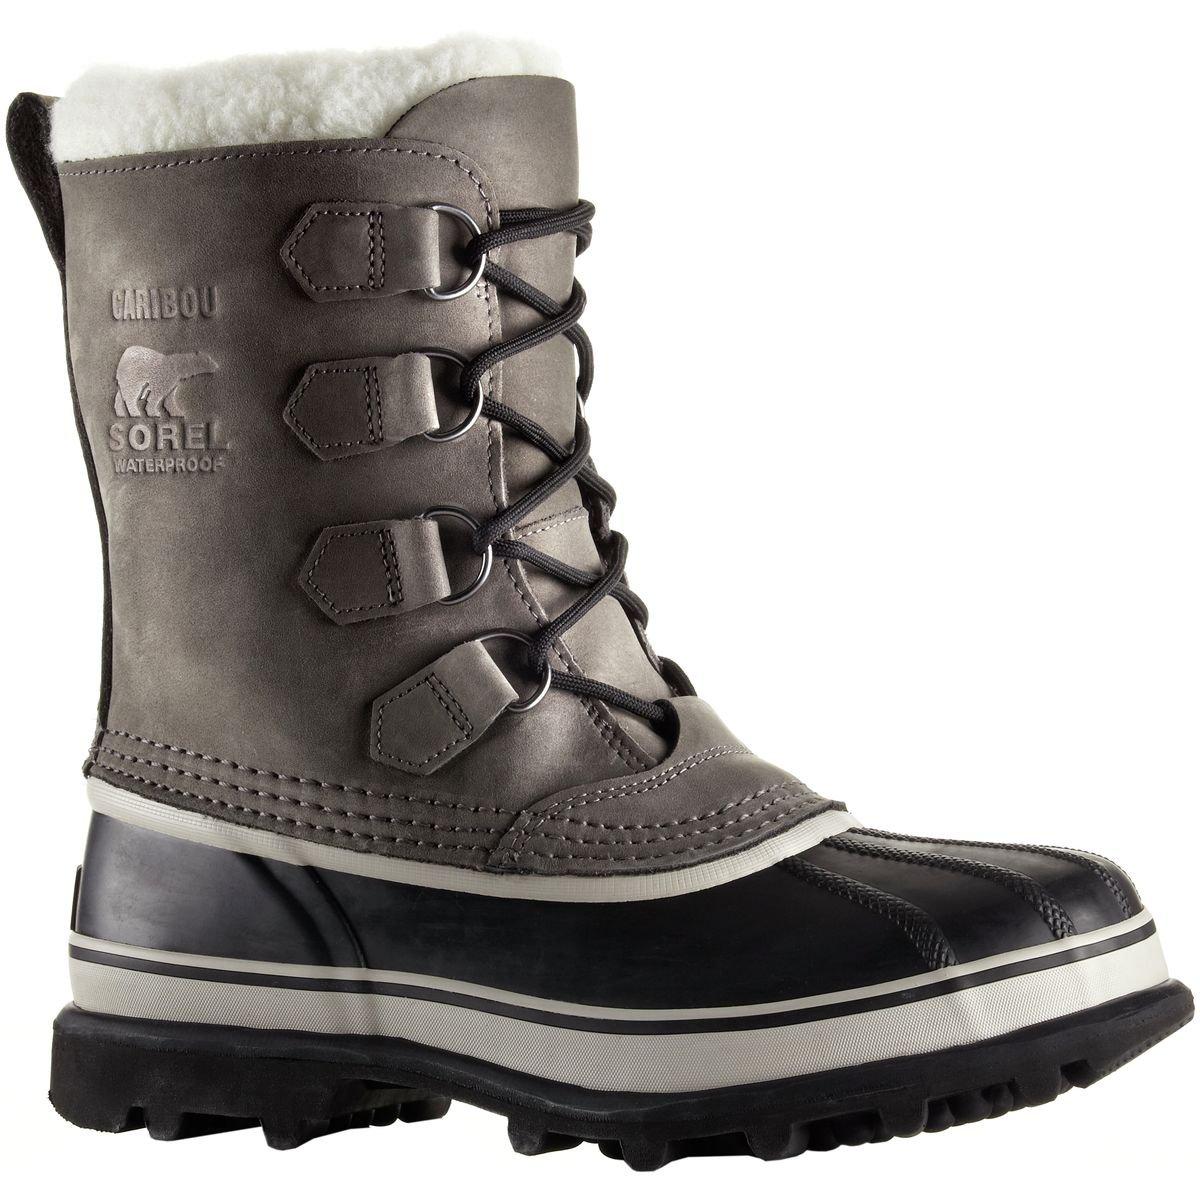 Sorel Women's Caribou Boot (10.5 B(M) US, Shale/stone)